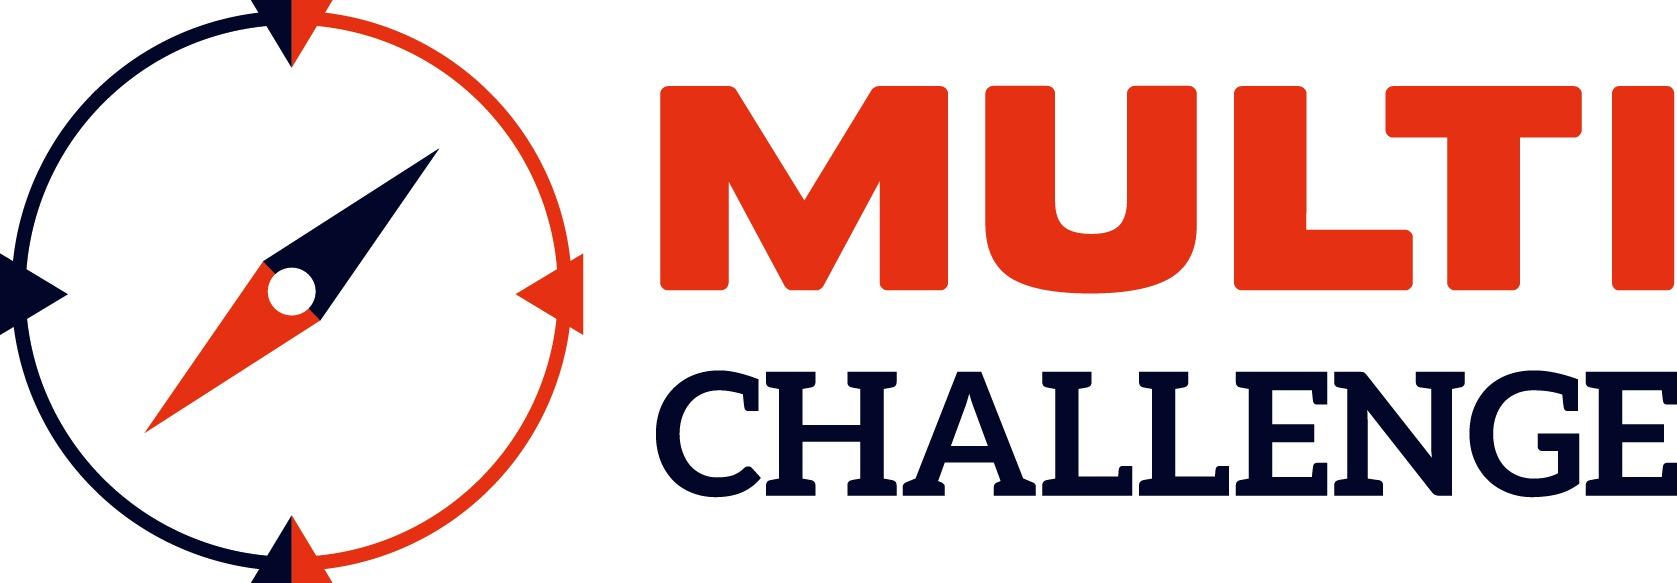 Multi-Challenge